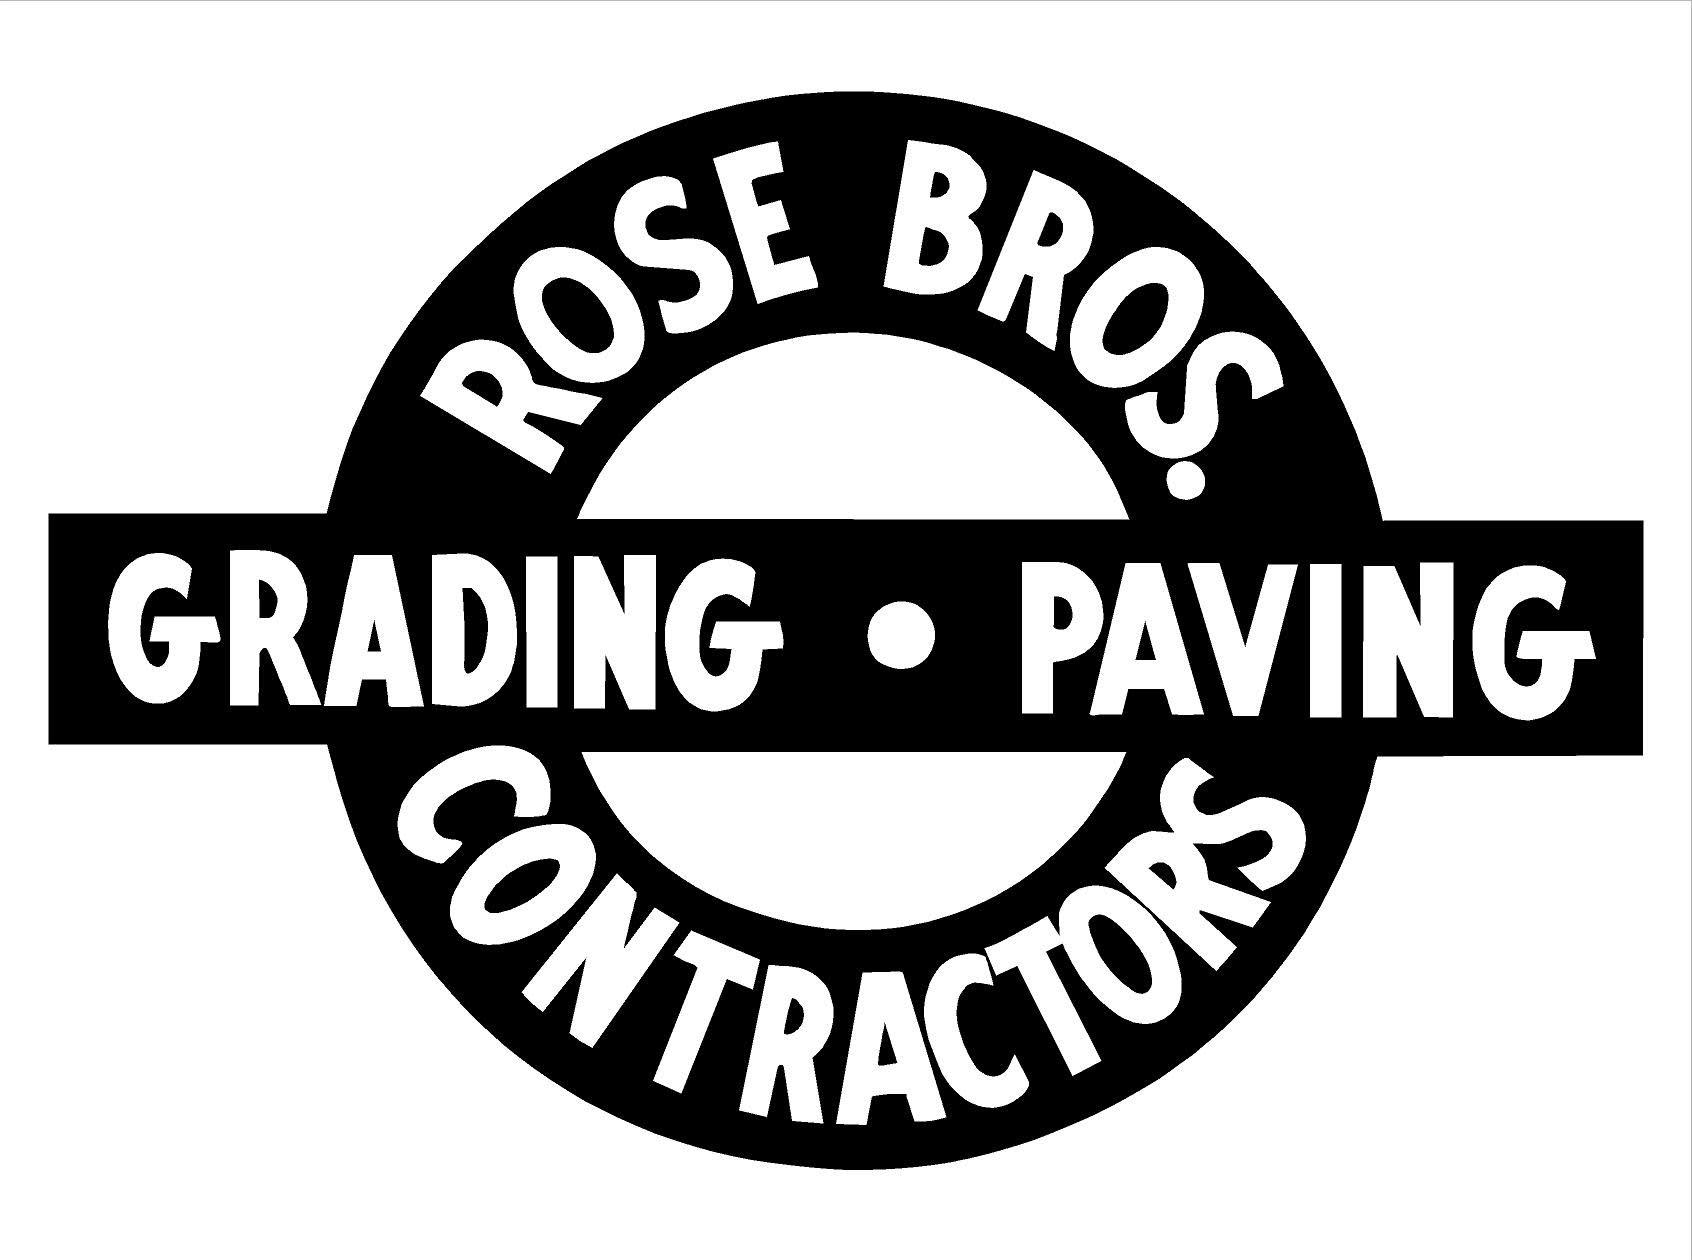 Rose Bros.